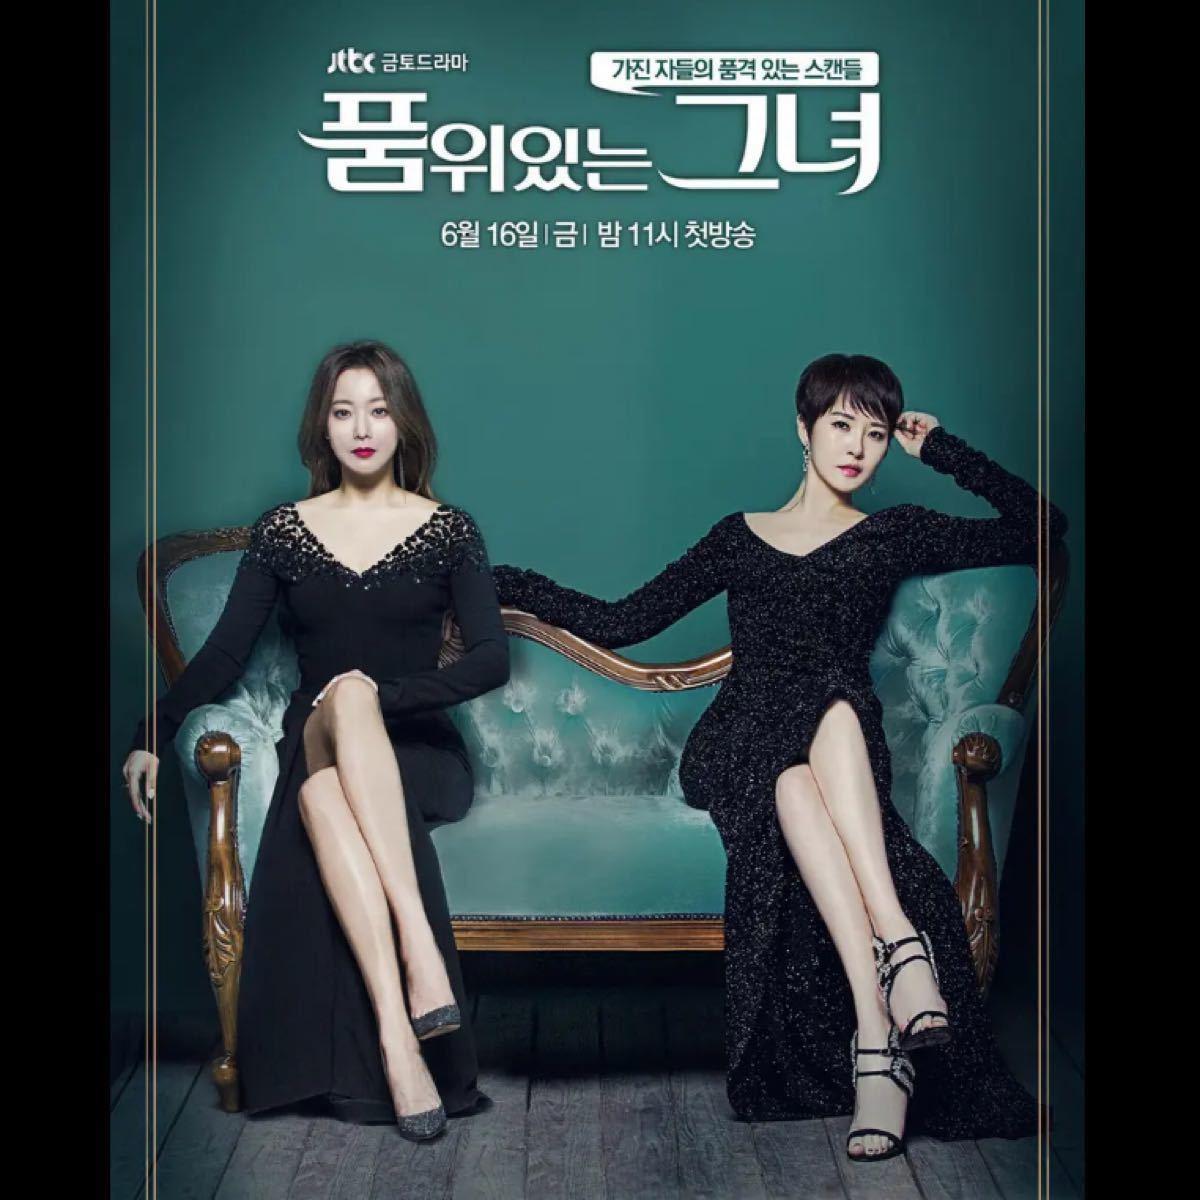 ◆ G.Wセール ◆ ☆韓国ドラマ☆『品位のある彼女』 Blu-ray  全話!!